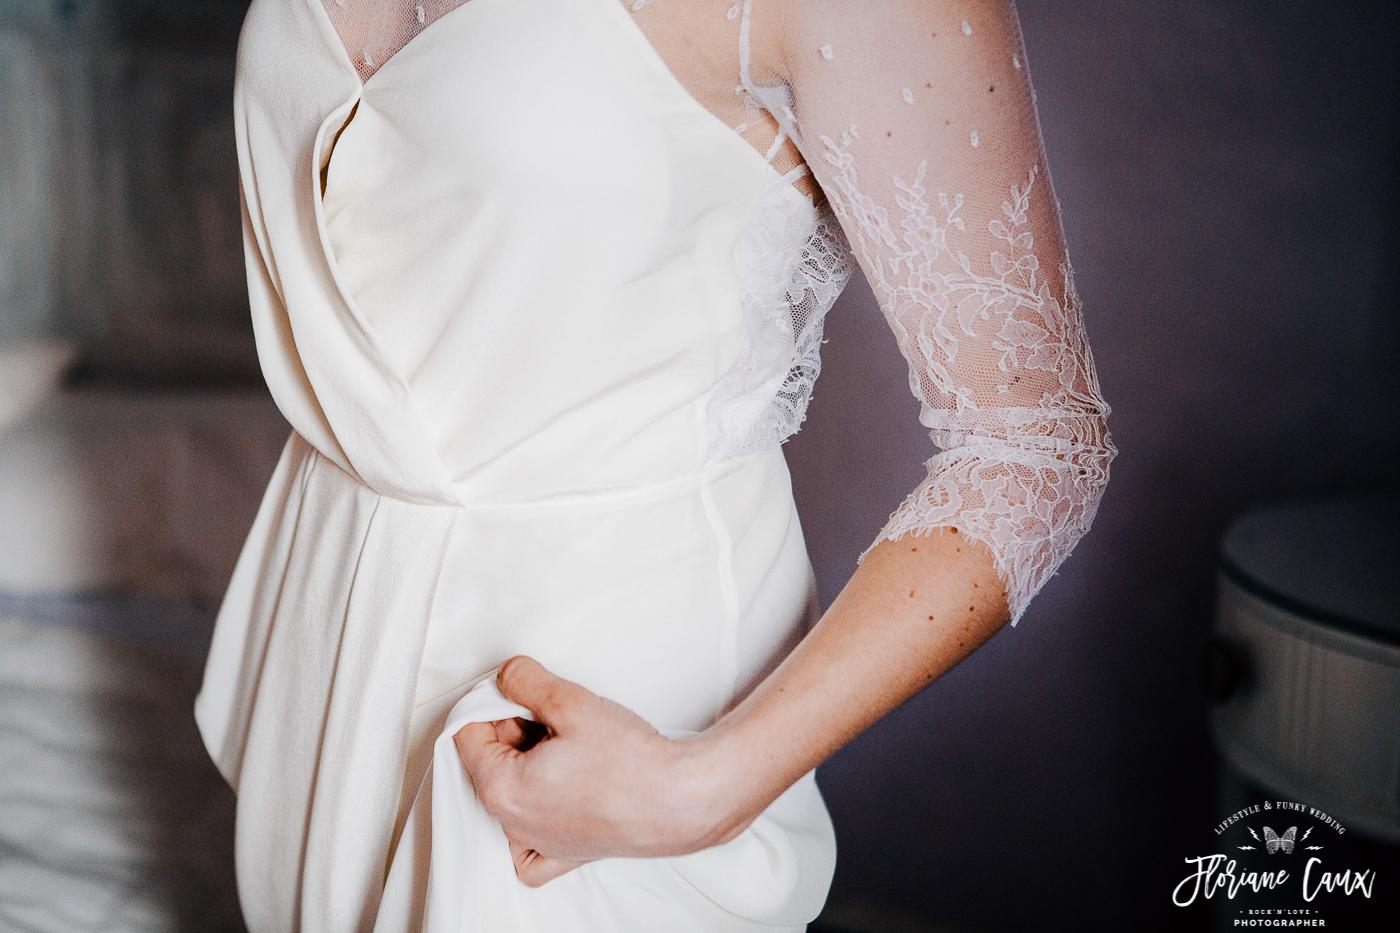 photographe-mariage-pays-basque-Floriane-Caux (11)